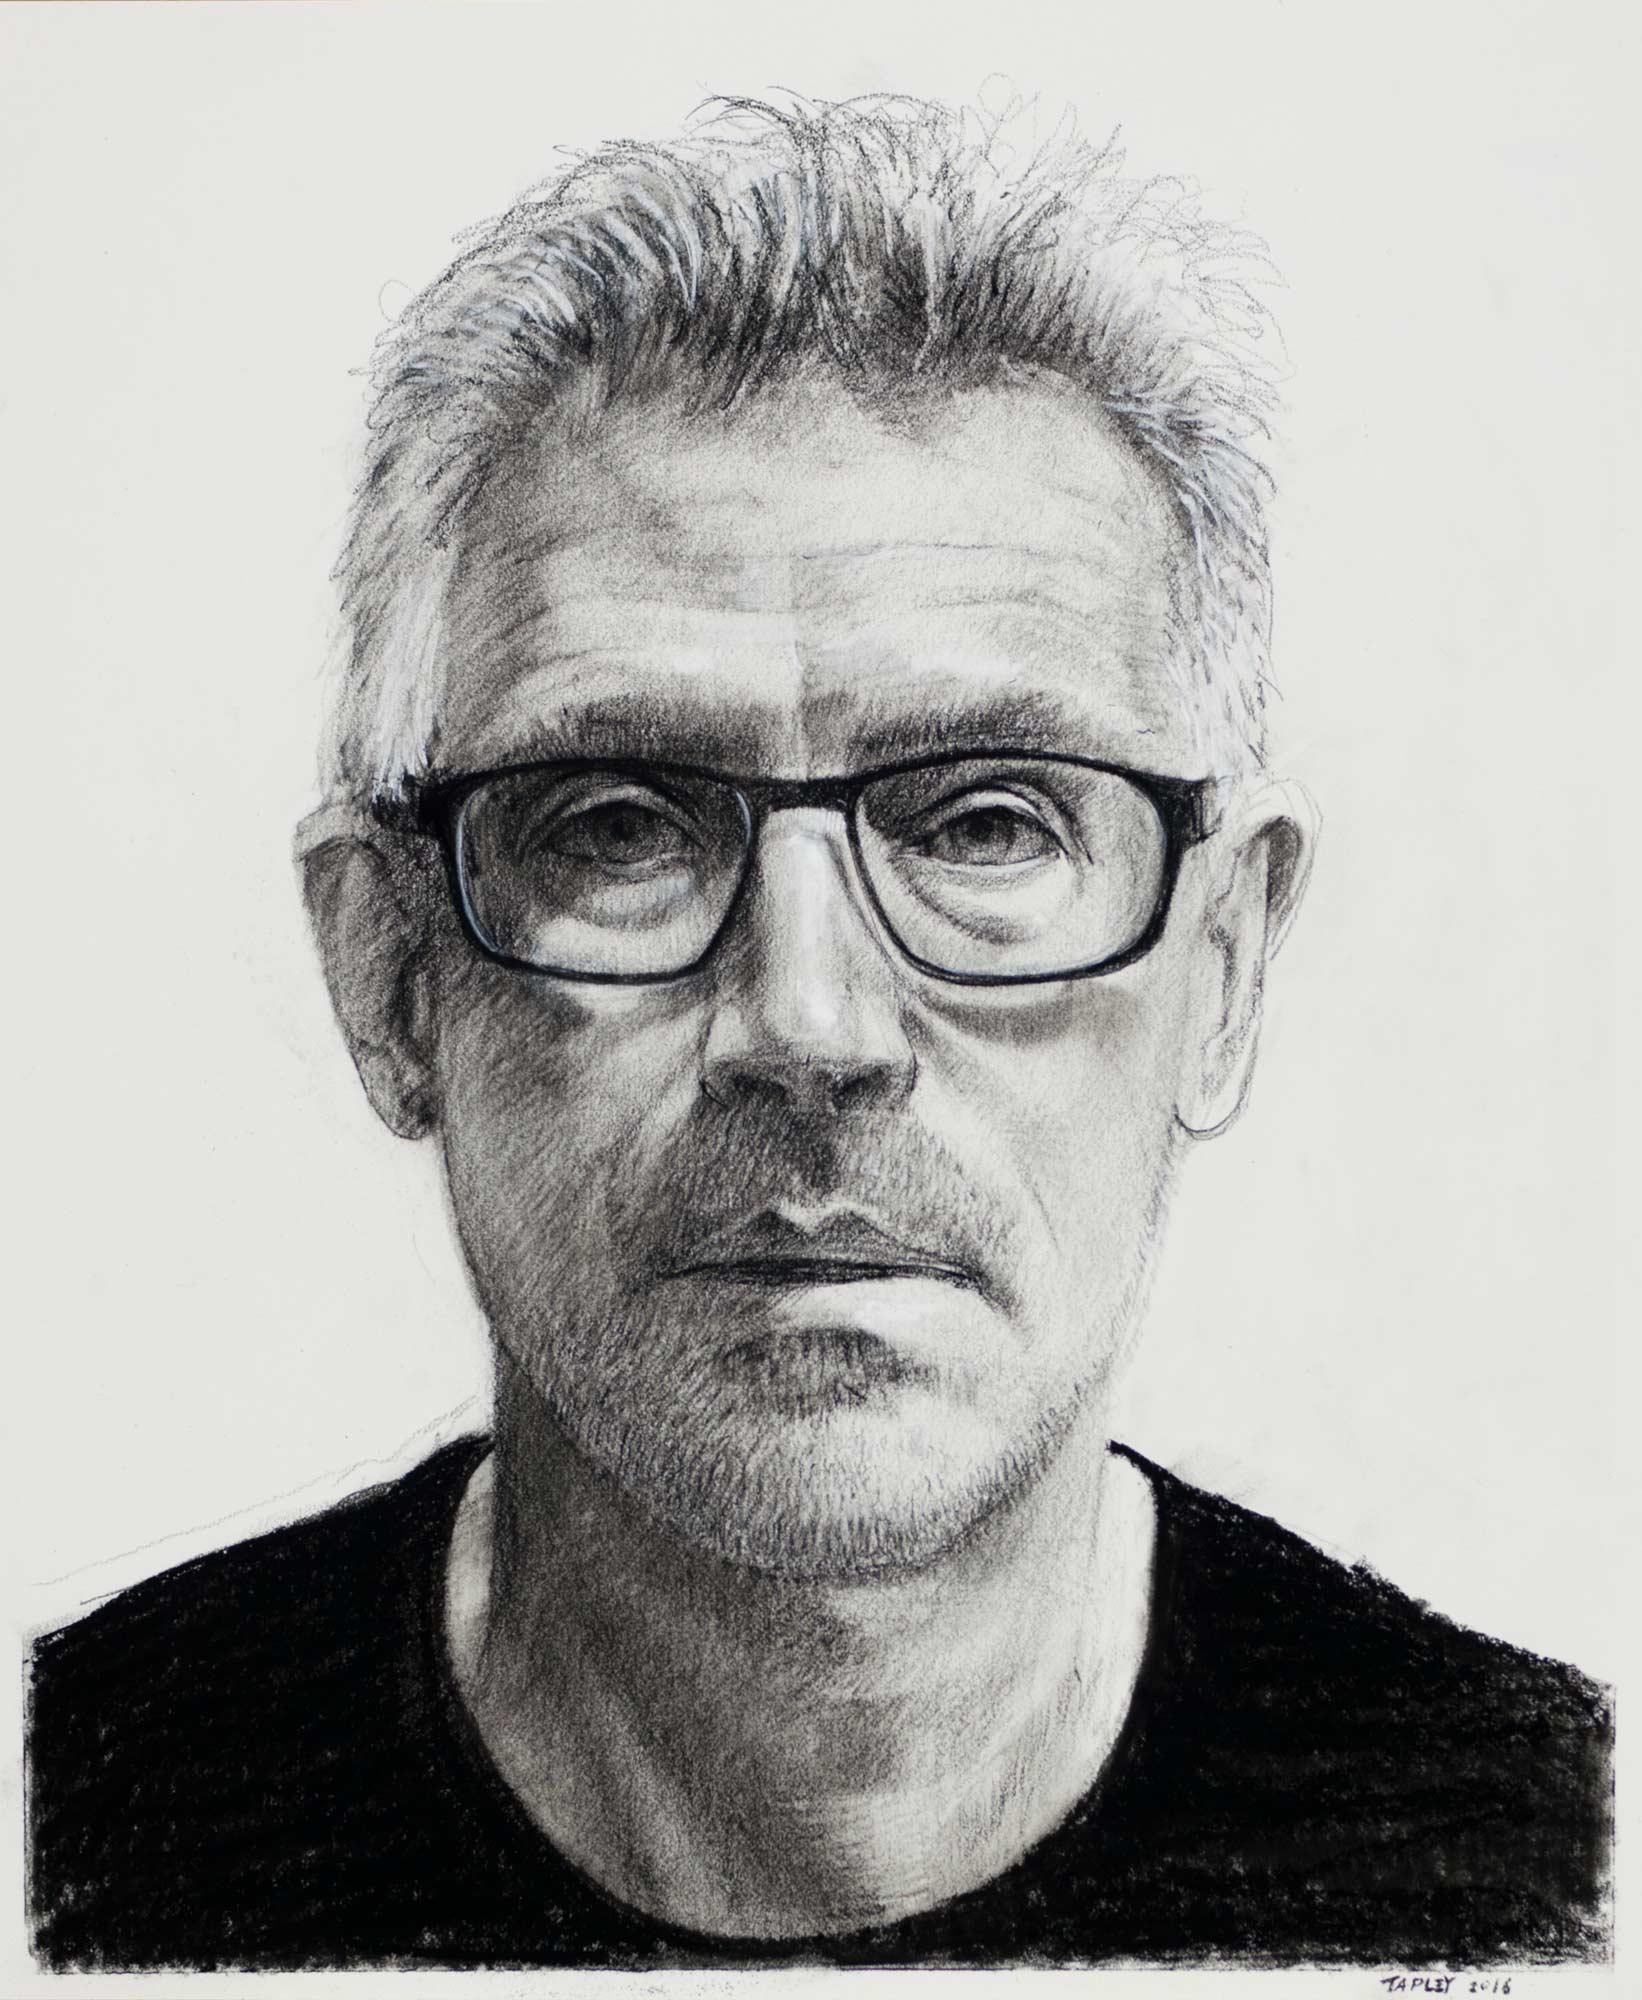 Self-Portrait, October 2016